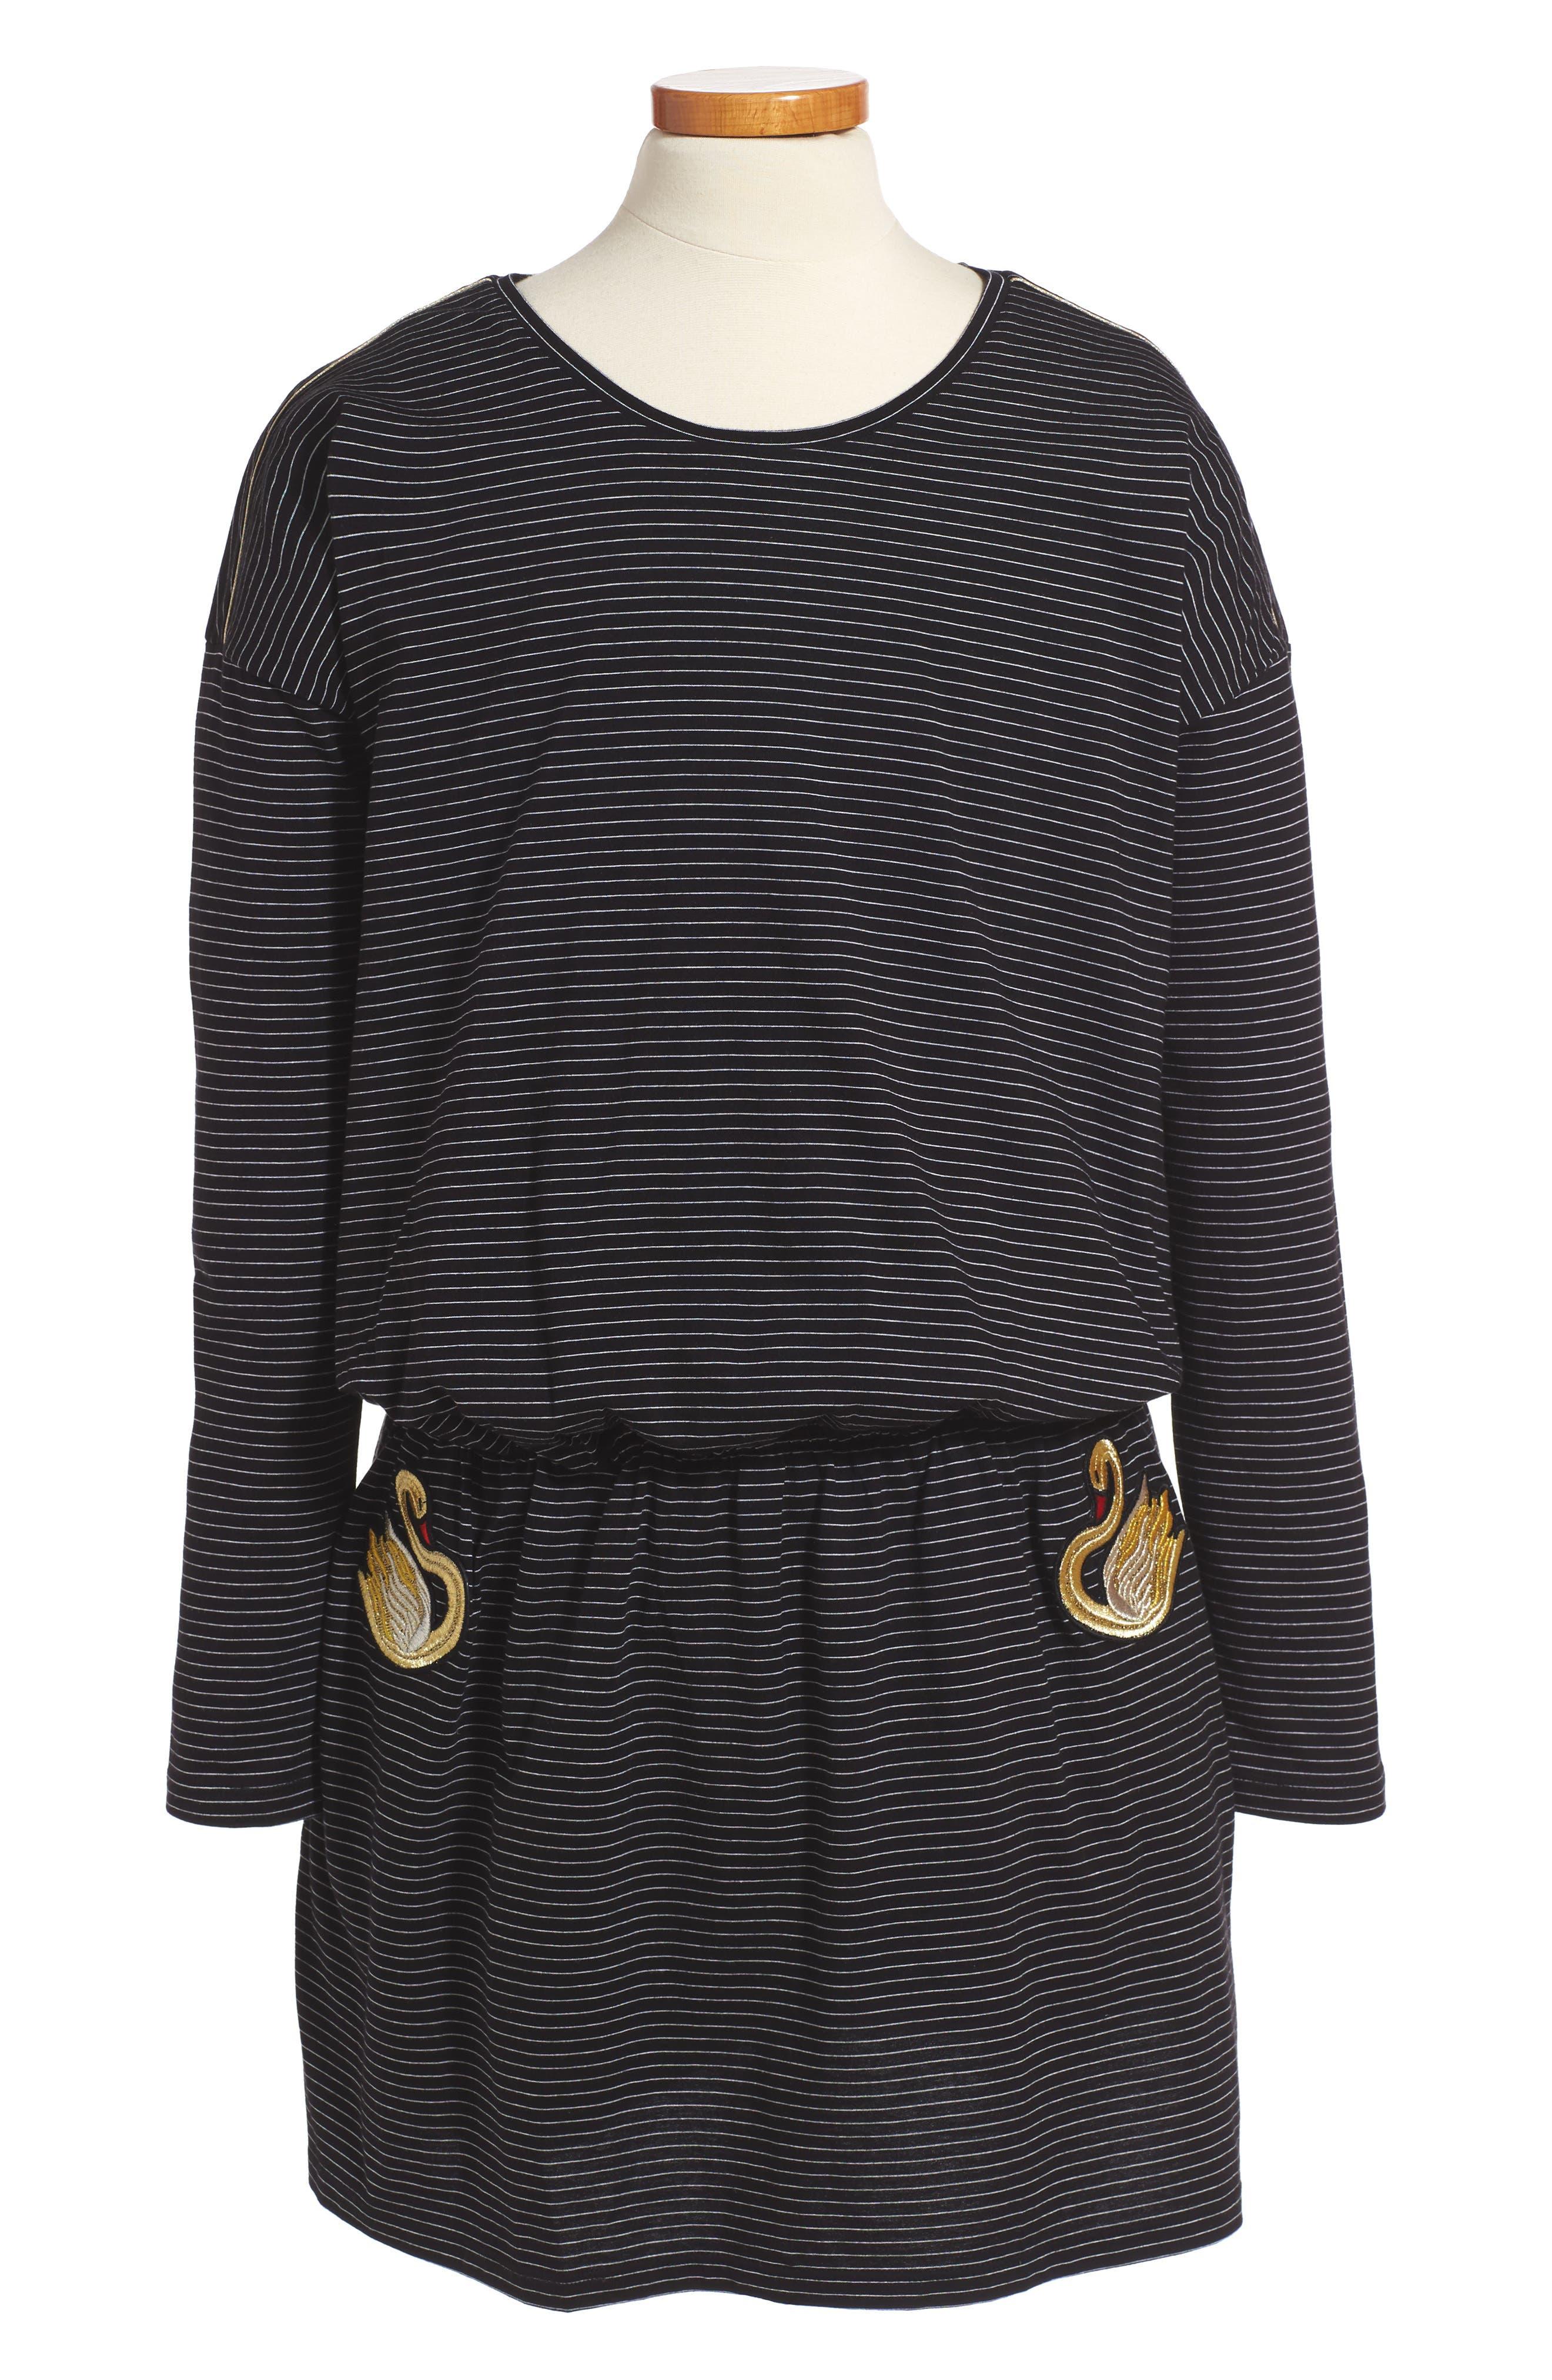 Swan Embroidered Blouson Dress,                             Main thumbnail 1, color,                             Black